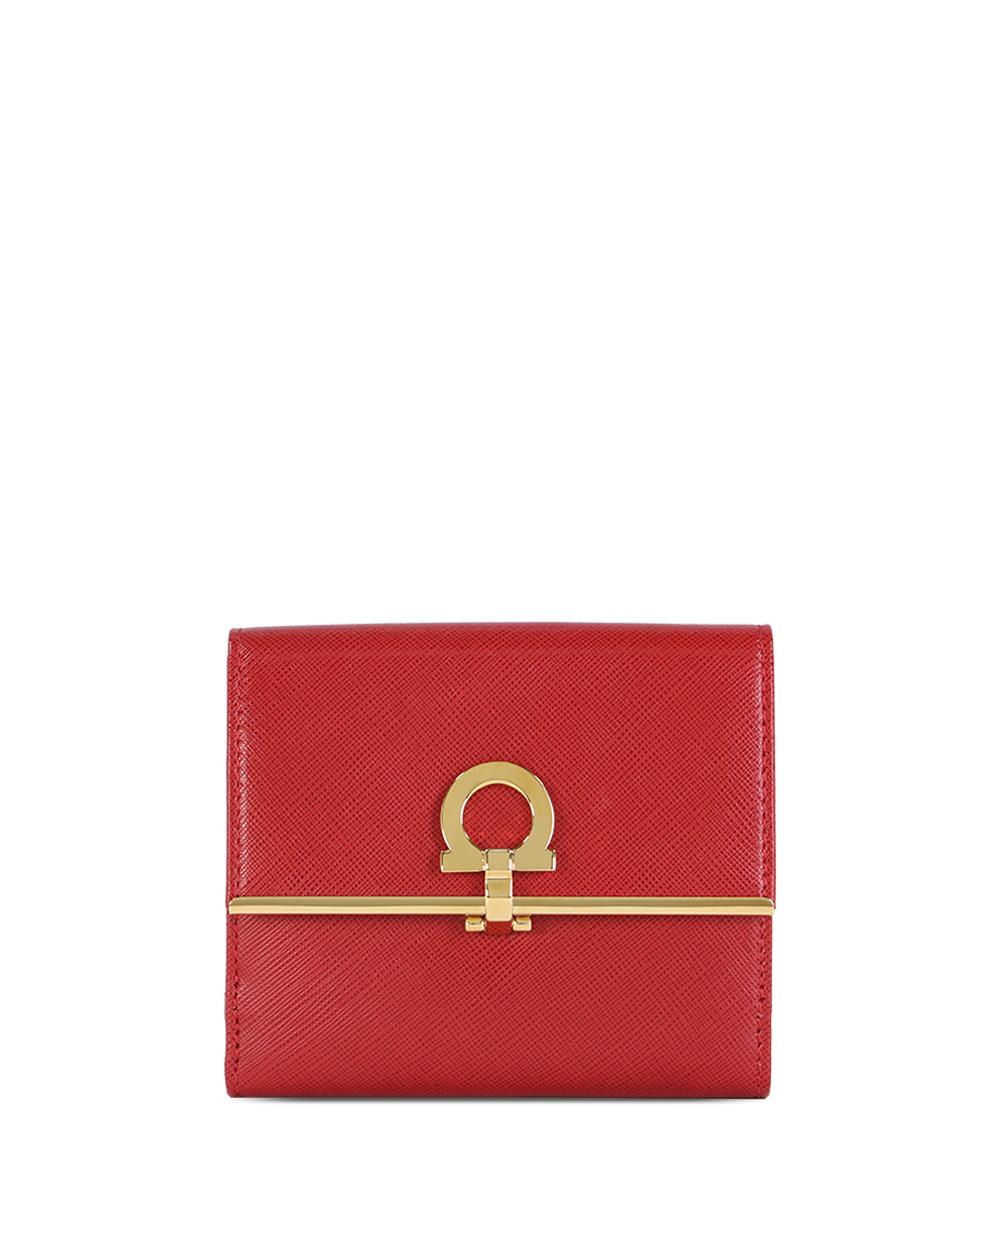 Gancino Clip Leather Wallet